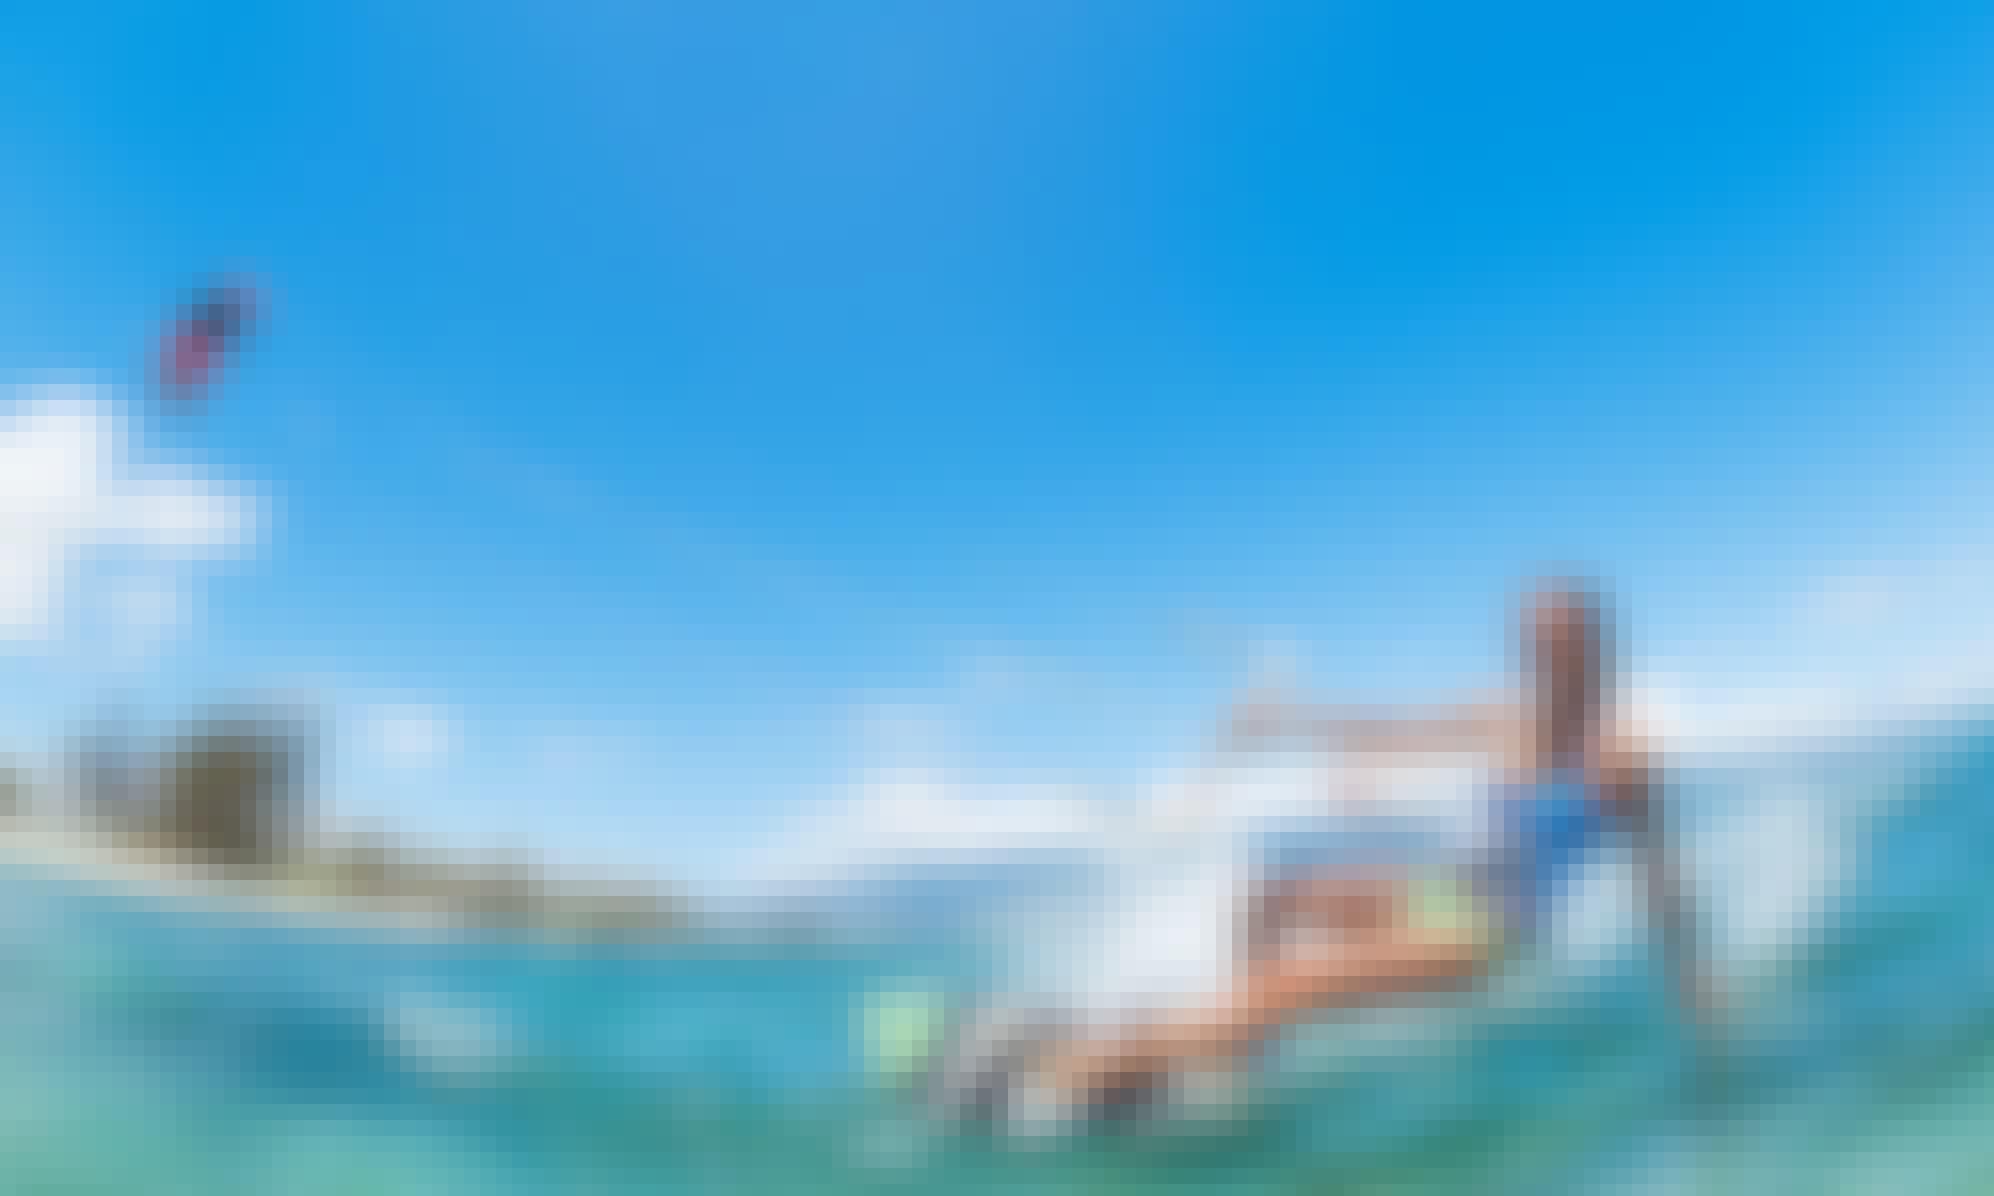 Kite Surfing Rental in Tambon Sattahip